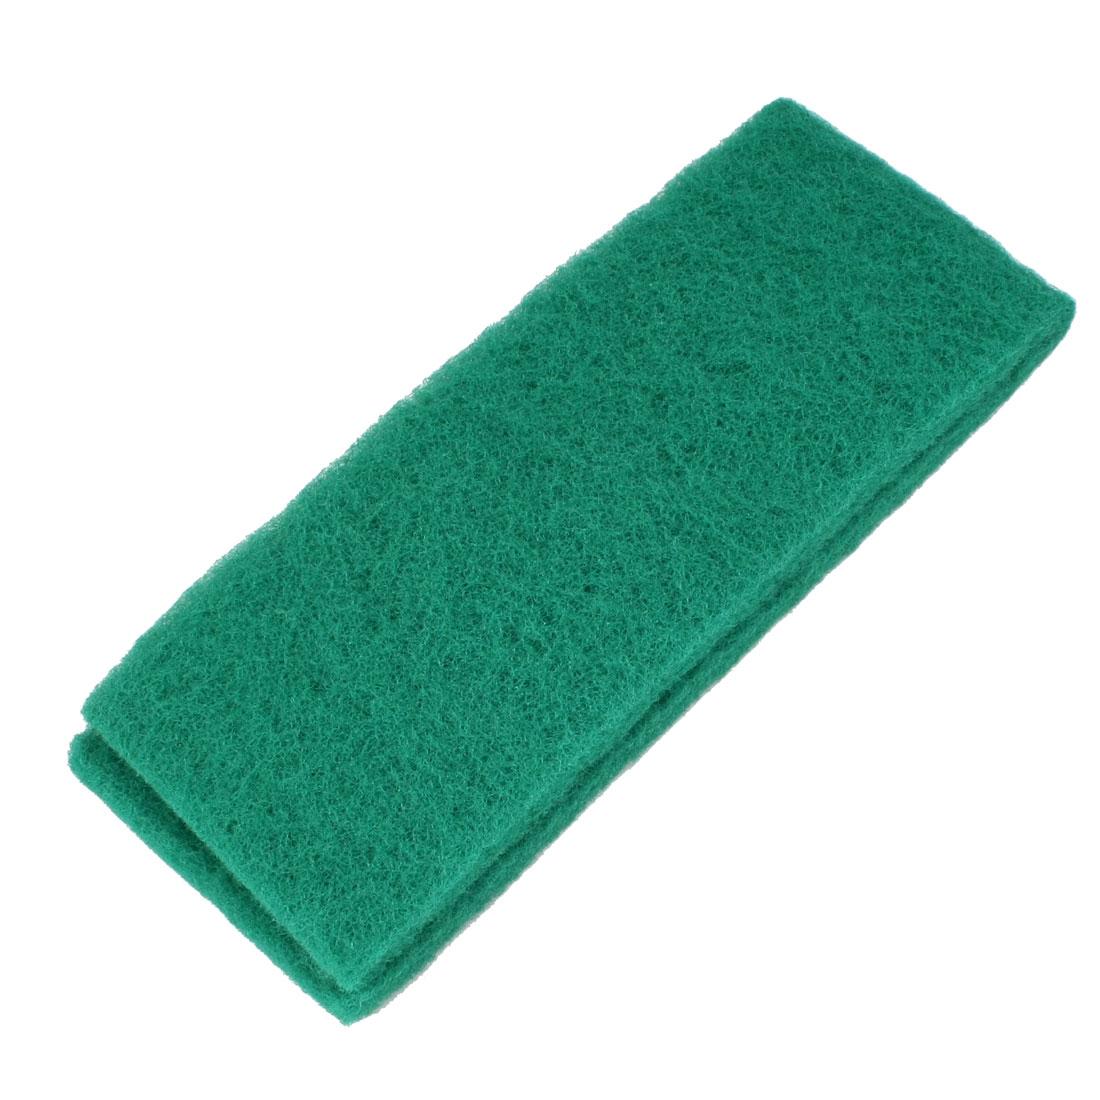 "12"" Long 2 Layers Biochemical Filter Sponge for Fish Tank Green"